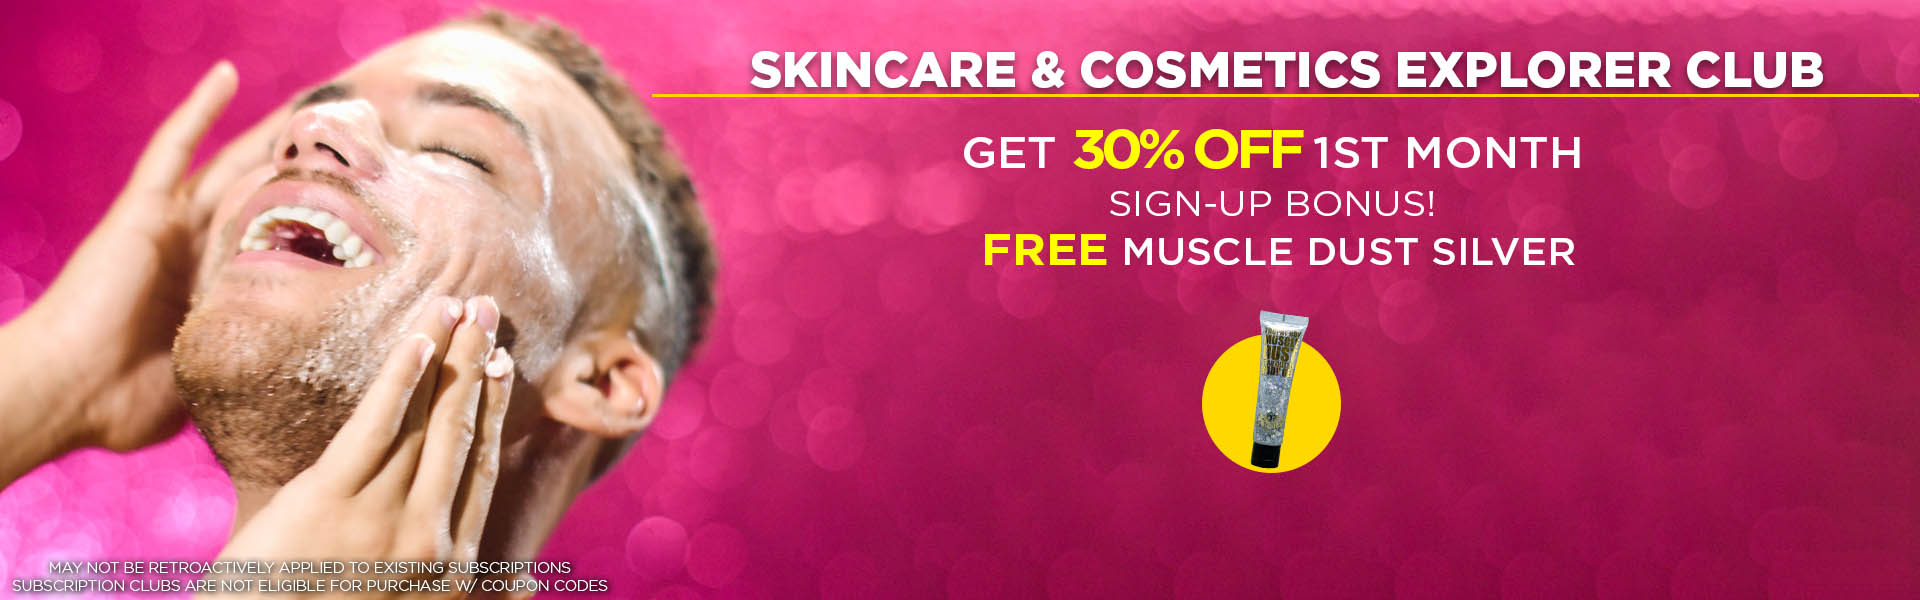 Skincare & Cosmetics Explorer Club